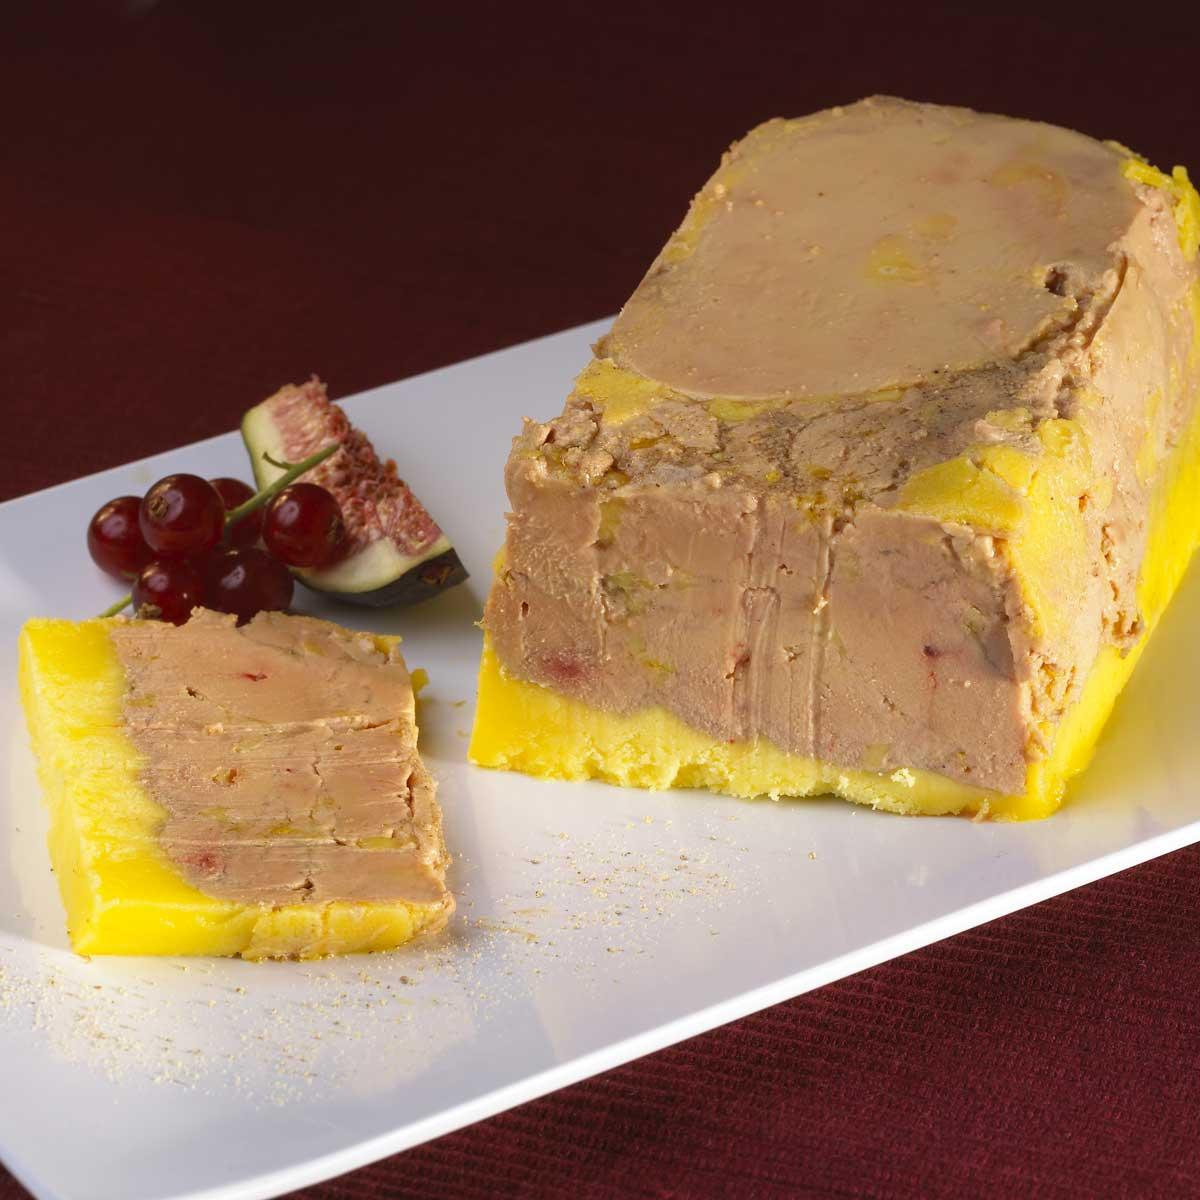 recette terrine de foie gras de canard cuisine madame figaro. Black Bedroom Furniture Sets. Home Design Ideas